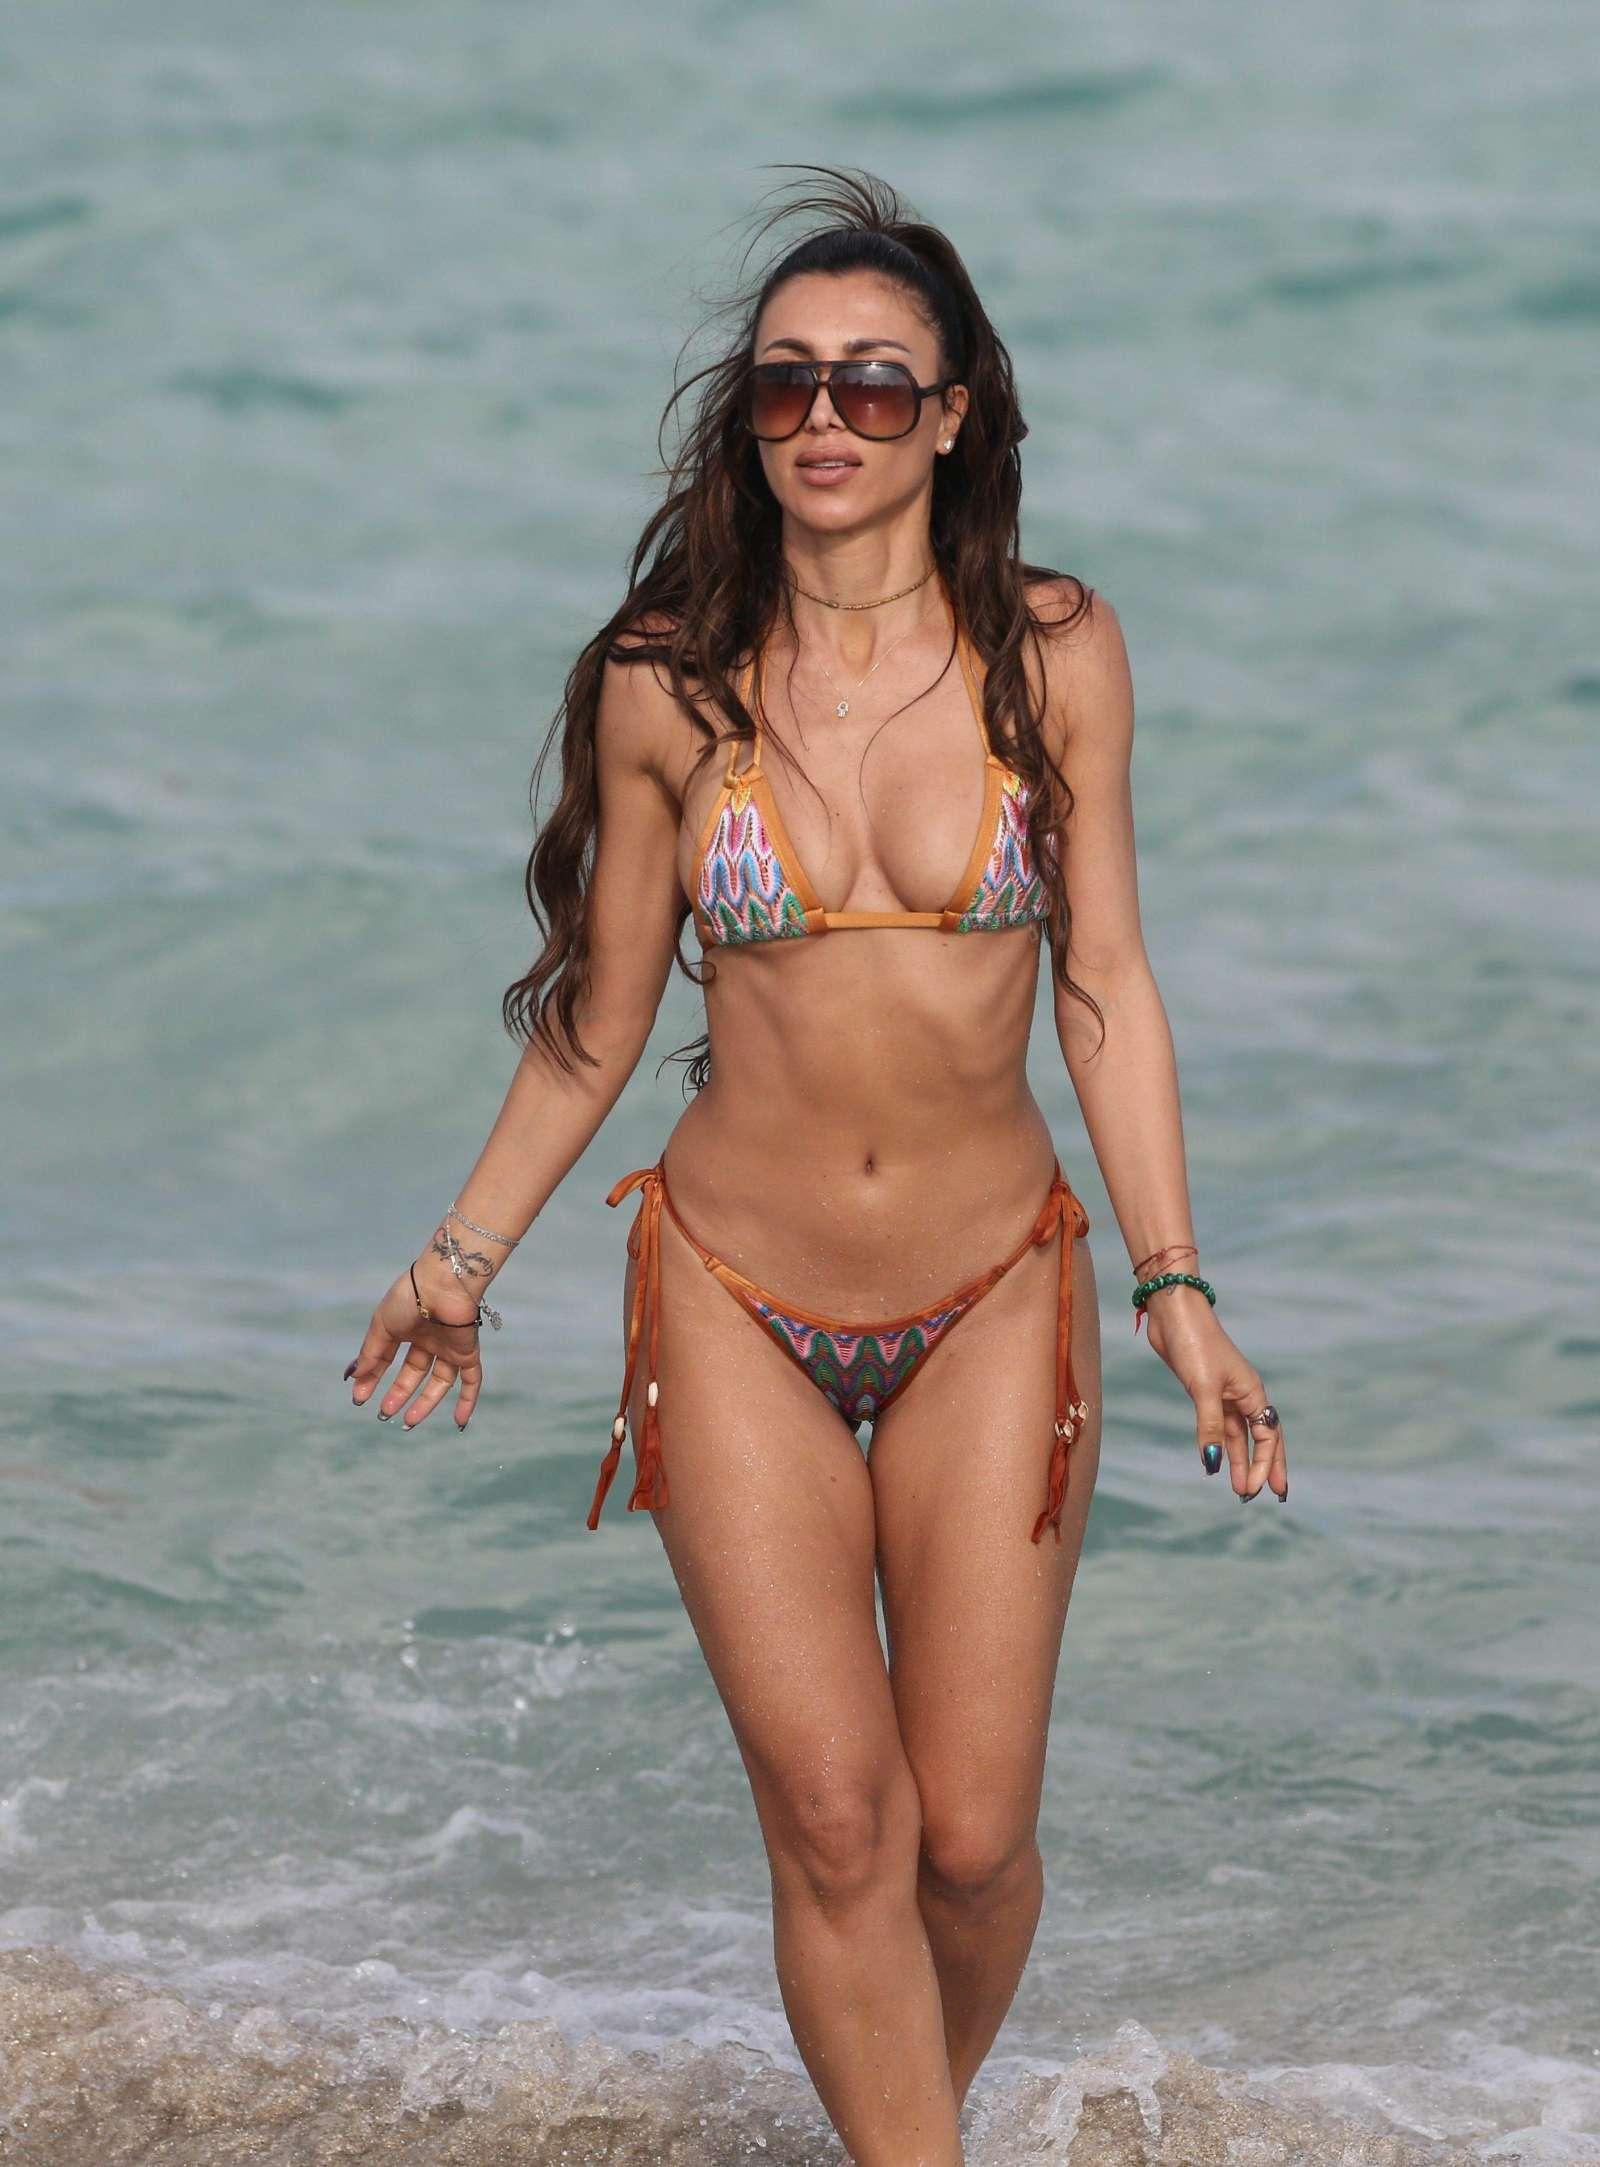 Metisha Schaefer Bikini Photoshoot on Miami Beach Pic 29 of 35